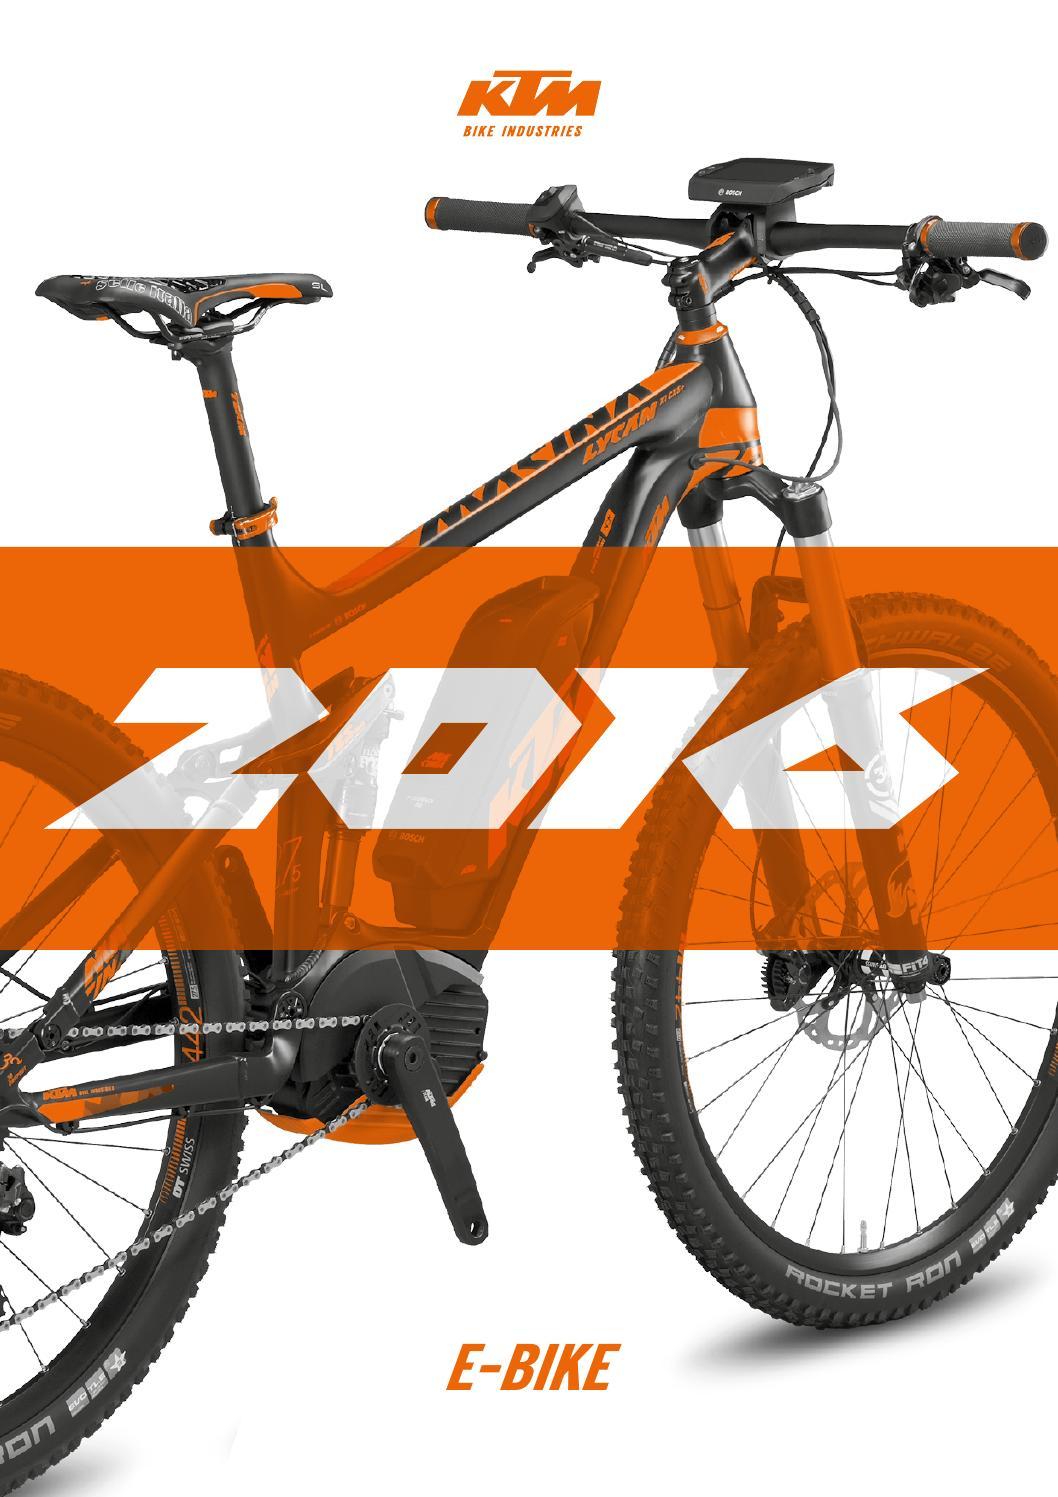 KTM E-Bike 2016 by KTM Bike Industries - issuu